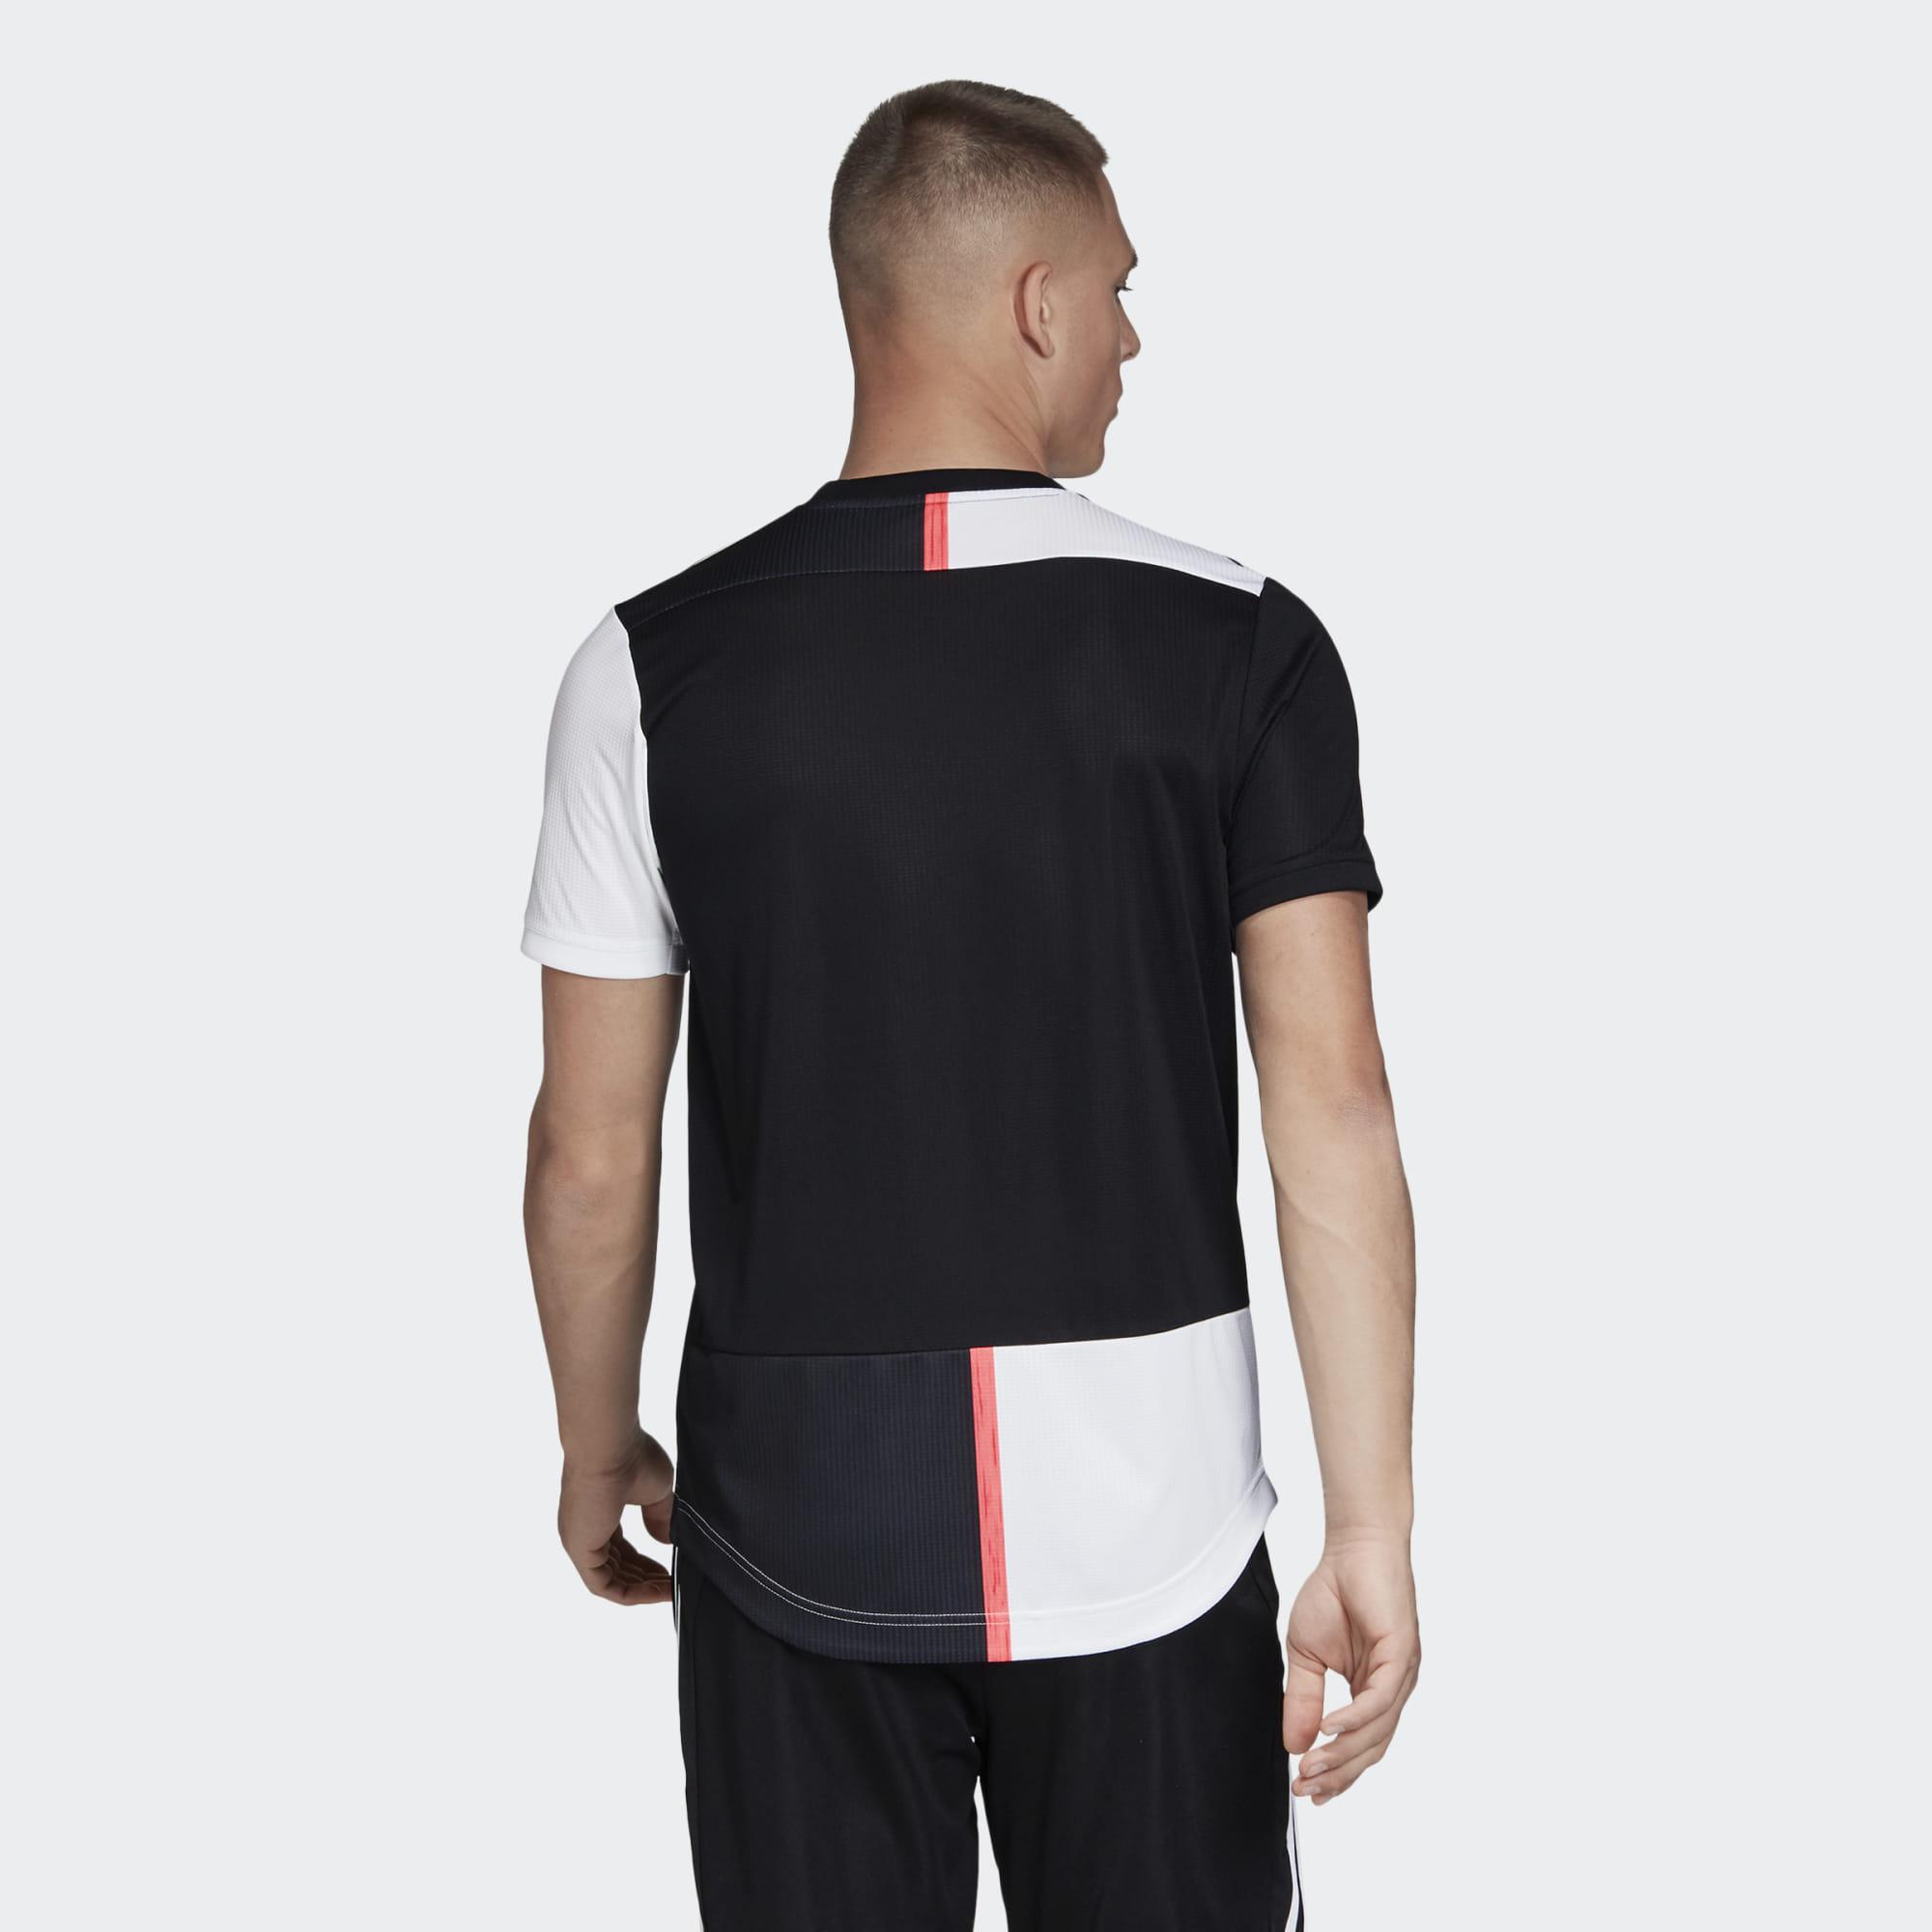 Juventus 2019-20 Adidas Home Kit | 19/20 Kits | Football ...